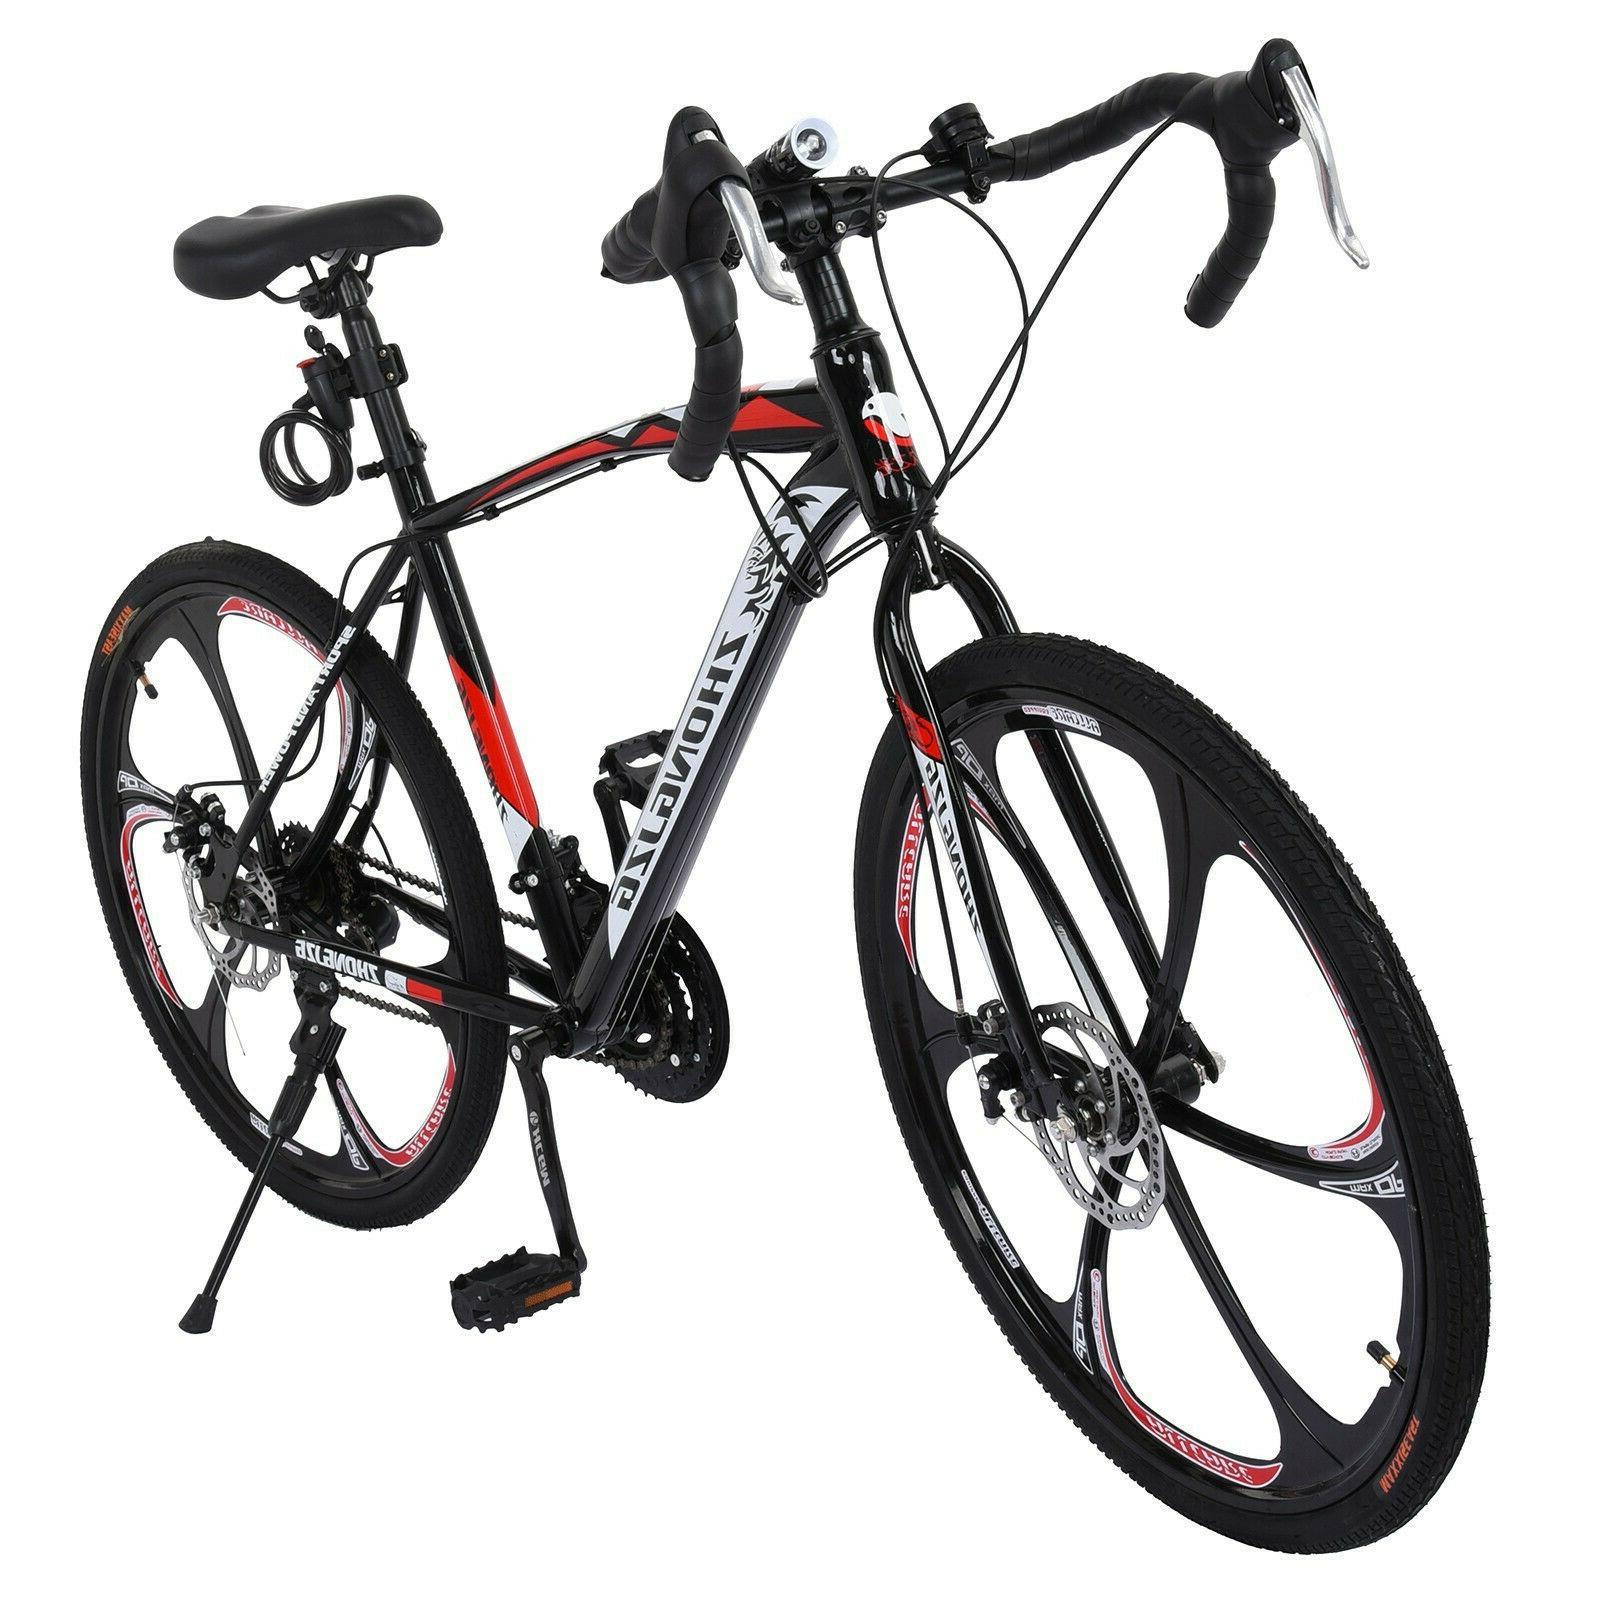 Full Mountain Bike 21 Women&Men's Bikes